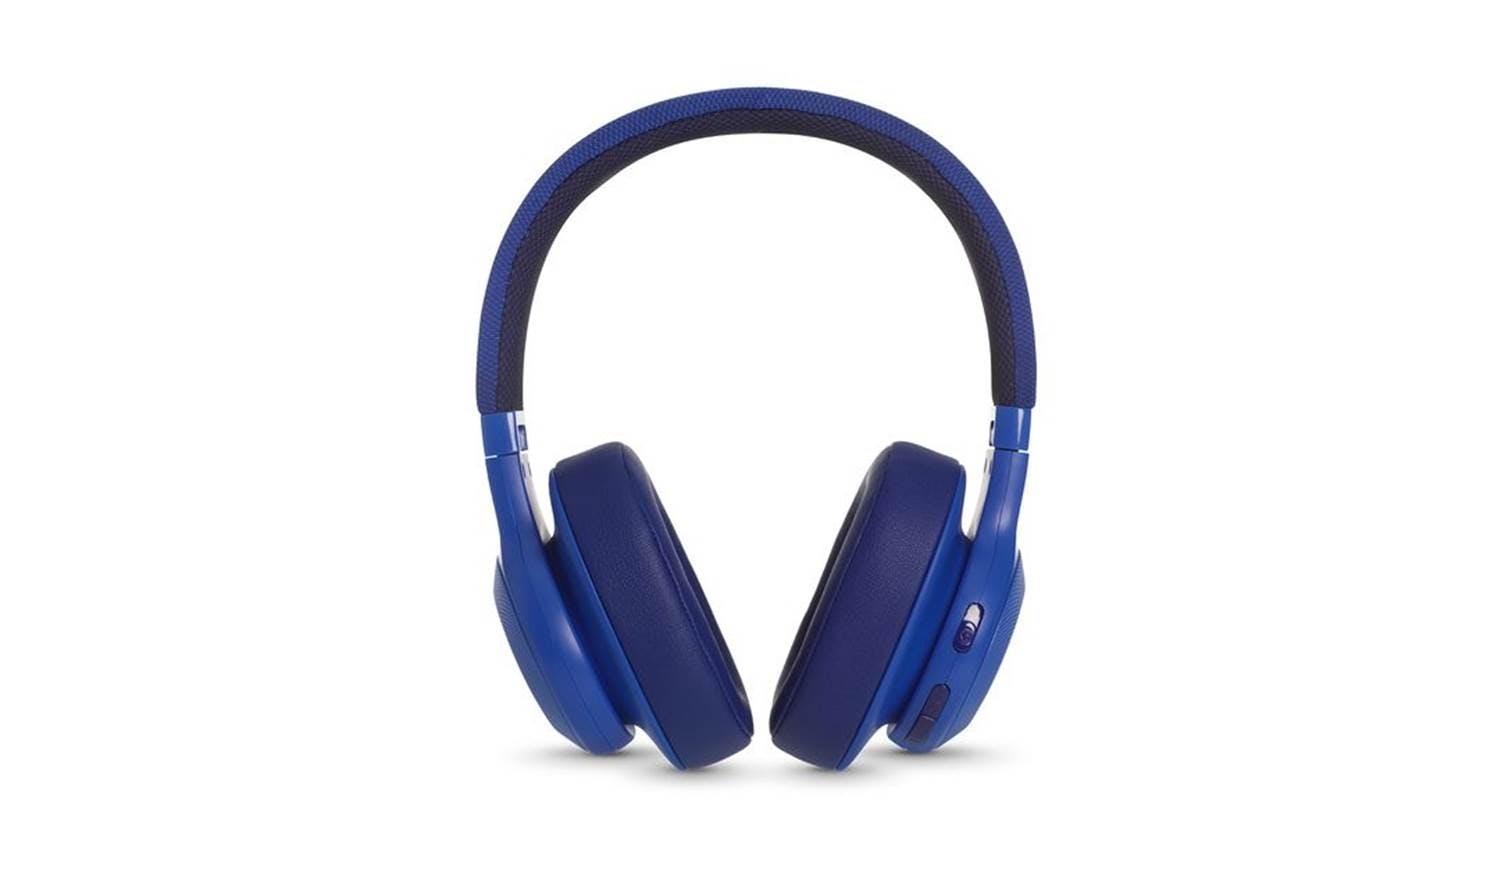 jbl e55 bluetooth over ear headphone blue harvey norman singapore. Black Bedroom Furniture Sets. Home Design Ideas